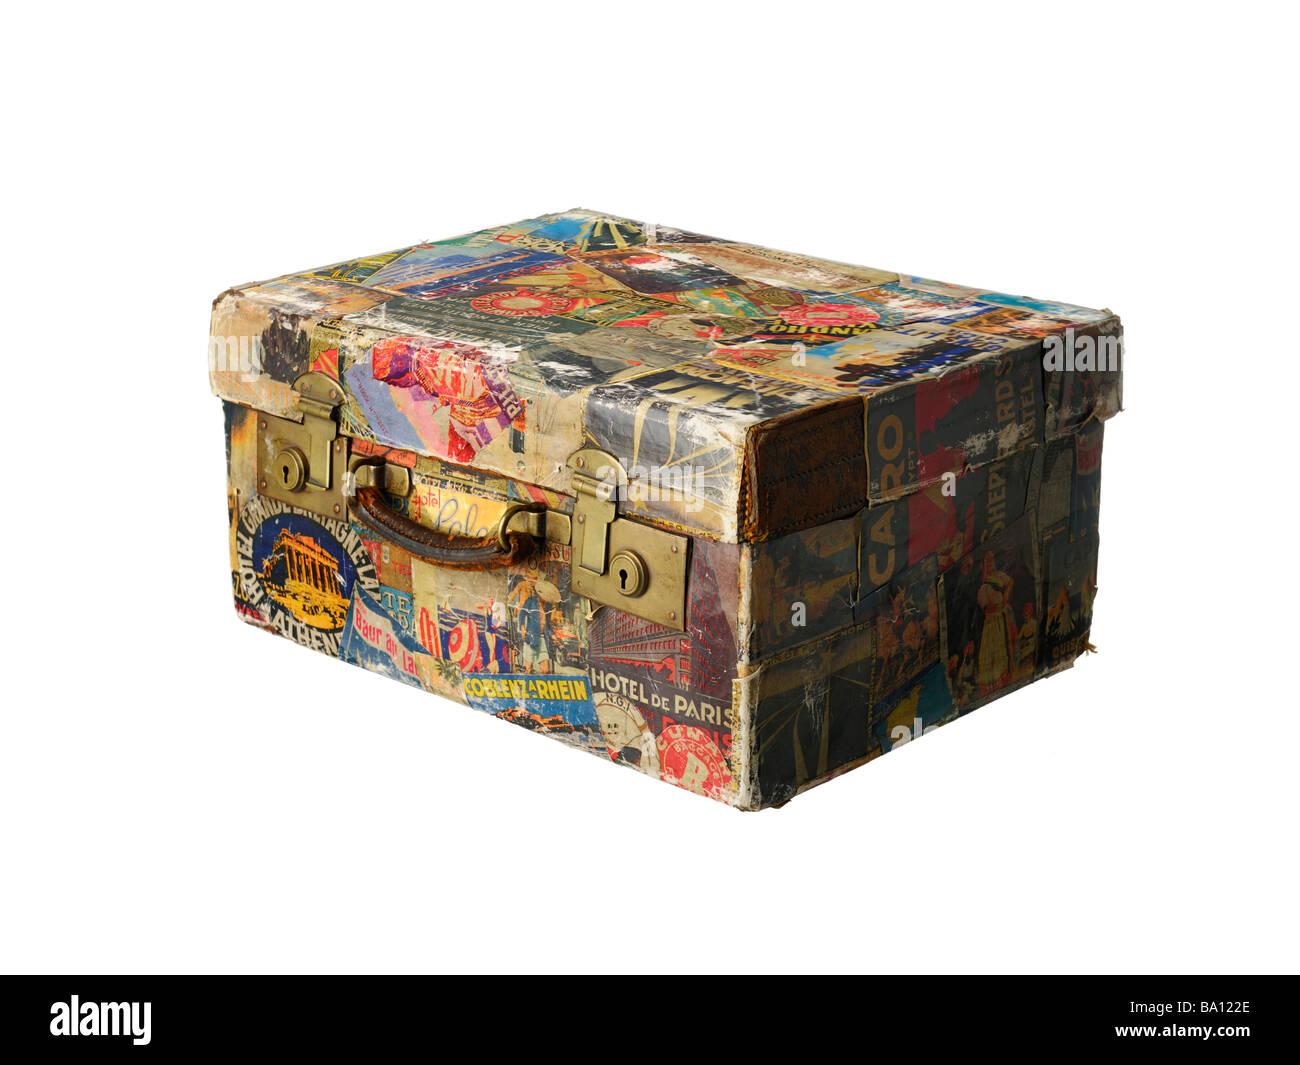 Vintage vecchia valigia viaggio retrò adesivi Immagini Stock